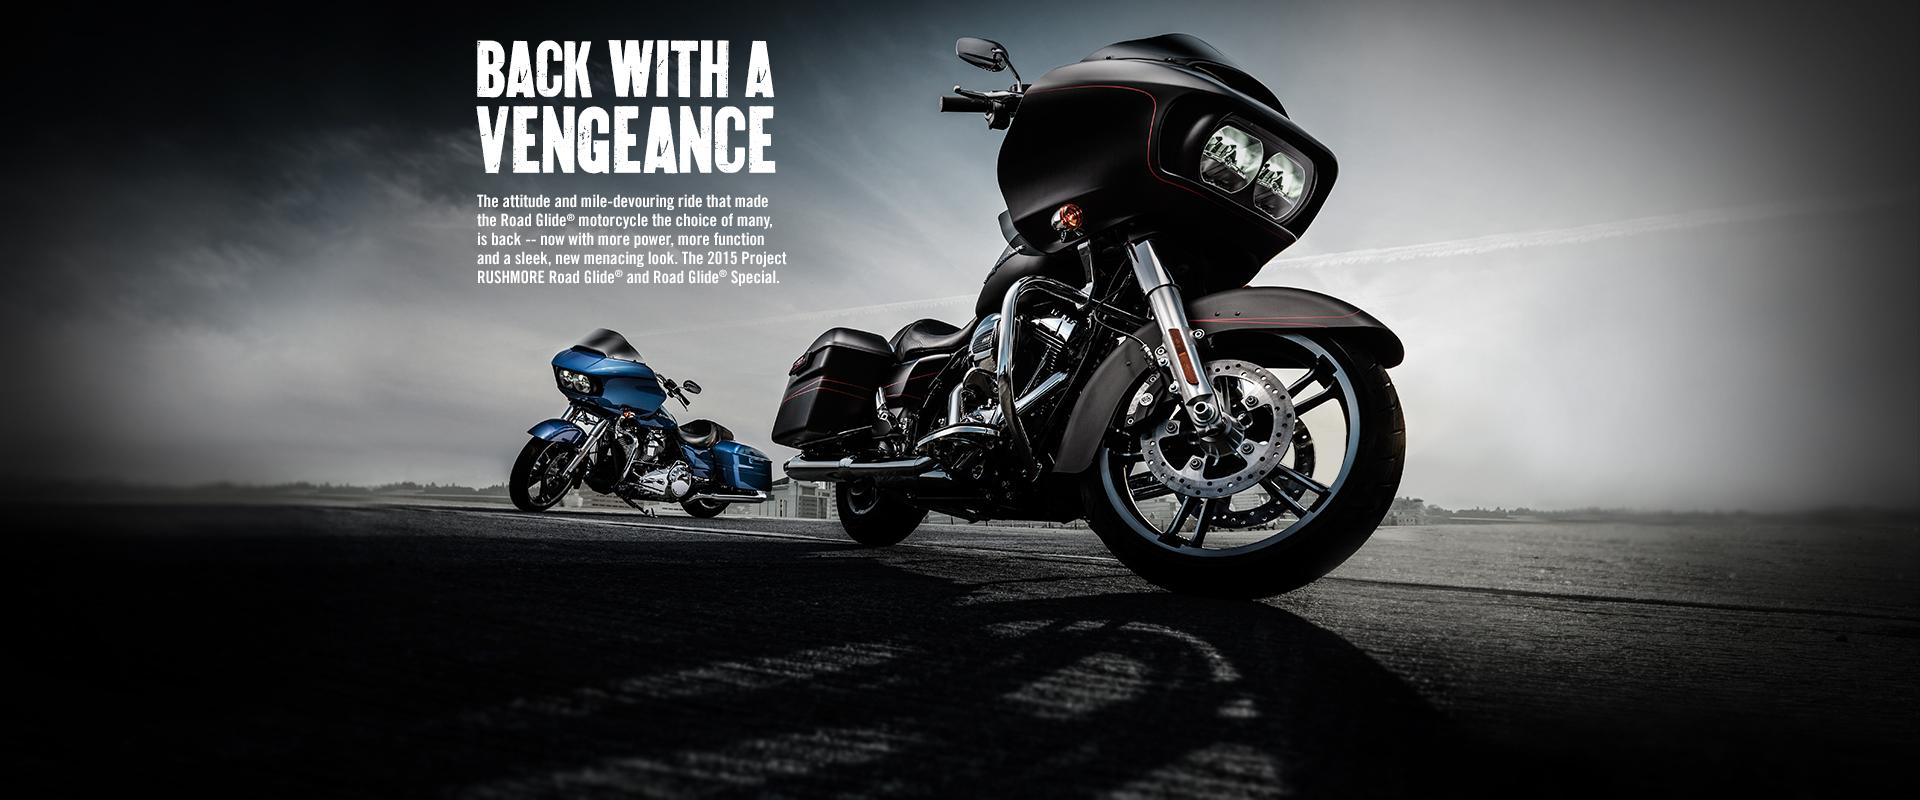 Harley-Davidson Updates the 2015 Road Glide [Photo Gallery]